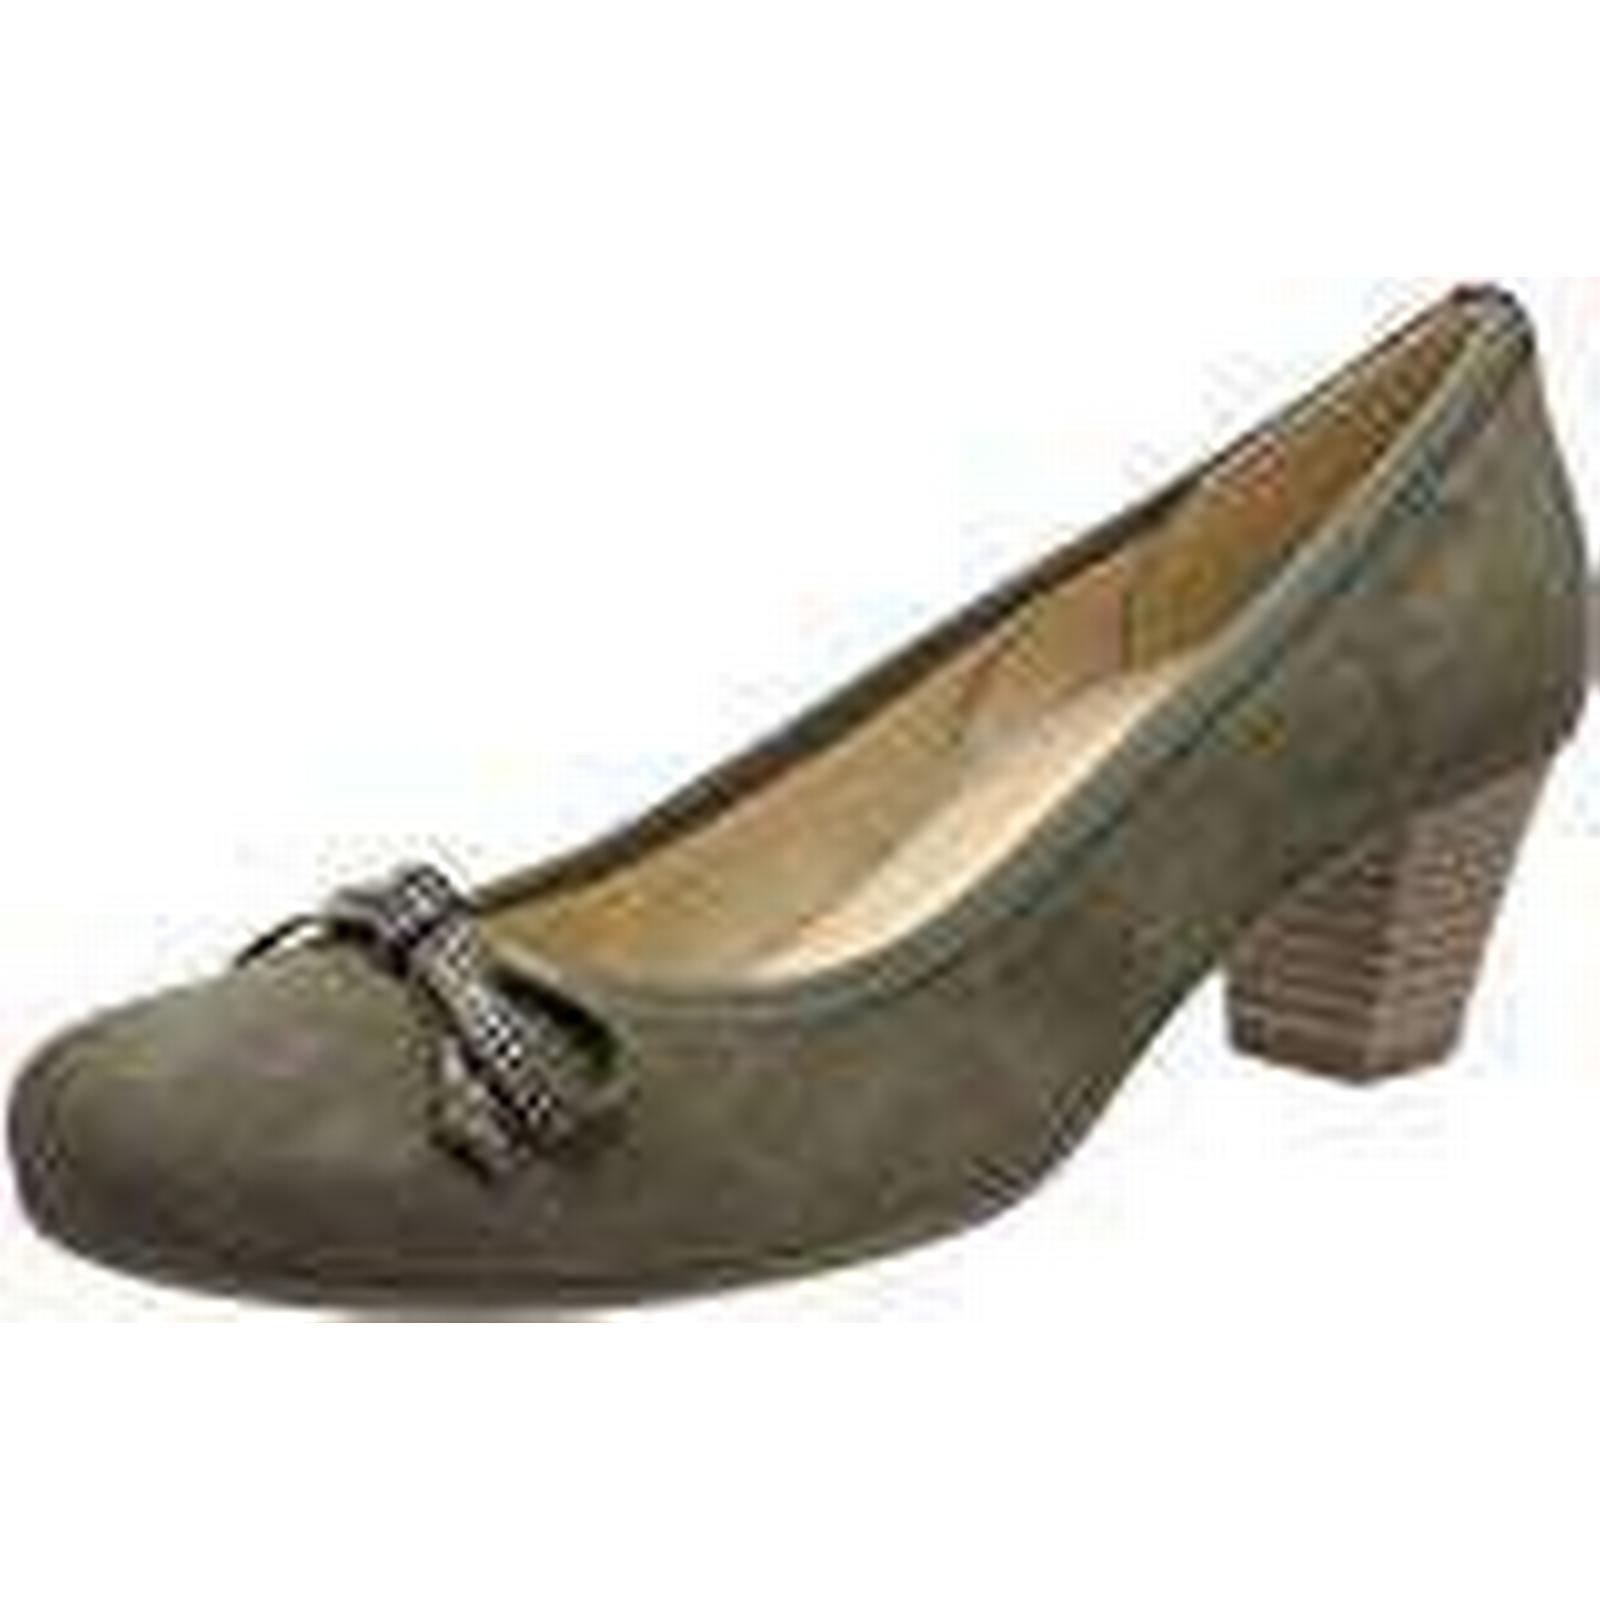 Gabor Shoes Women''s Basic Closed-Toe UK Pumps, Green (Oliv), 5 UK Closed-Toe b52c29